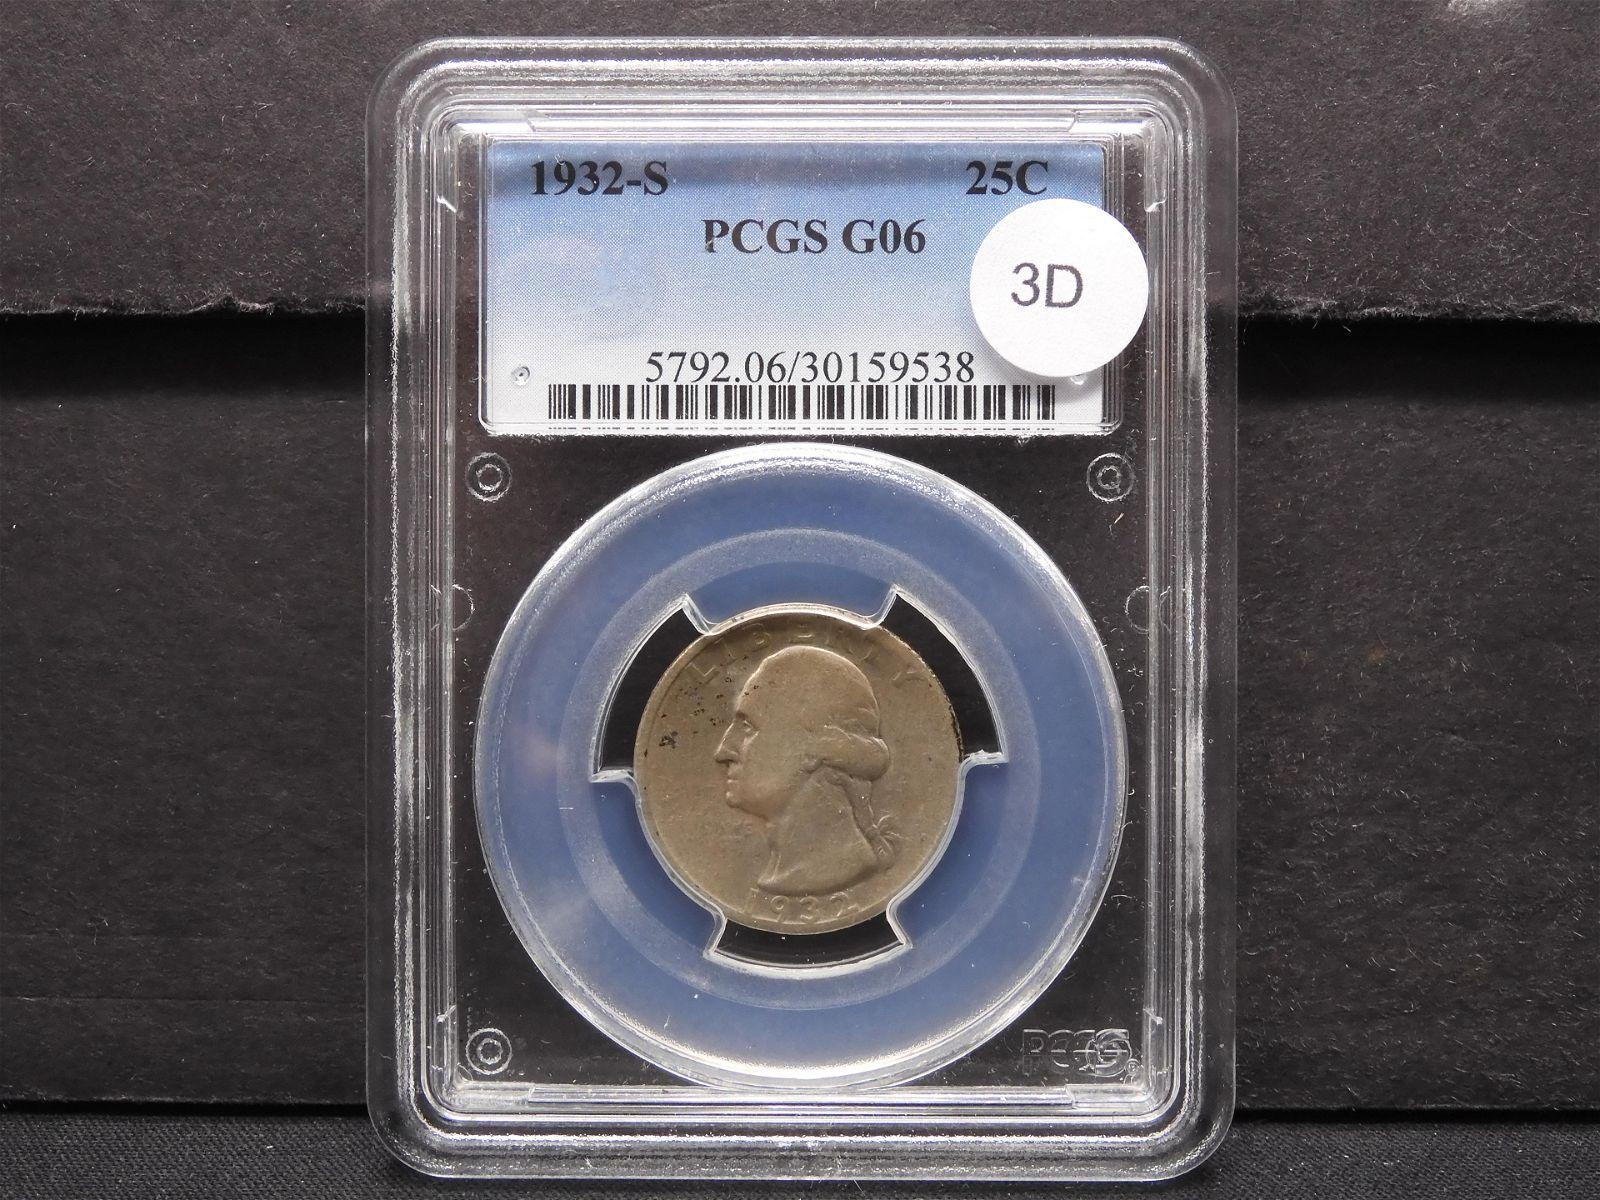 1932-S Washington 25c. PCGS G06.